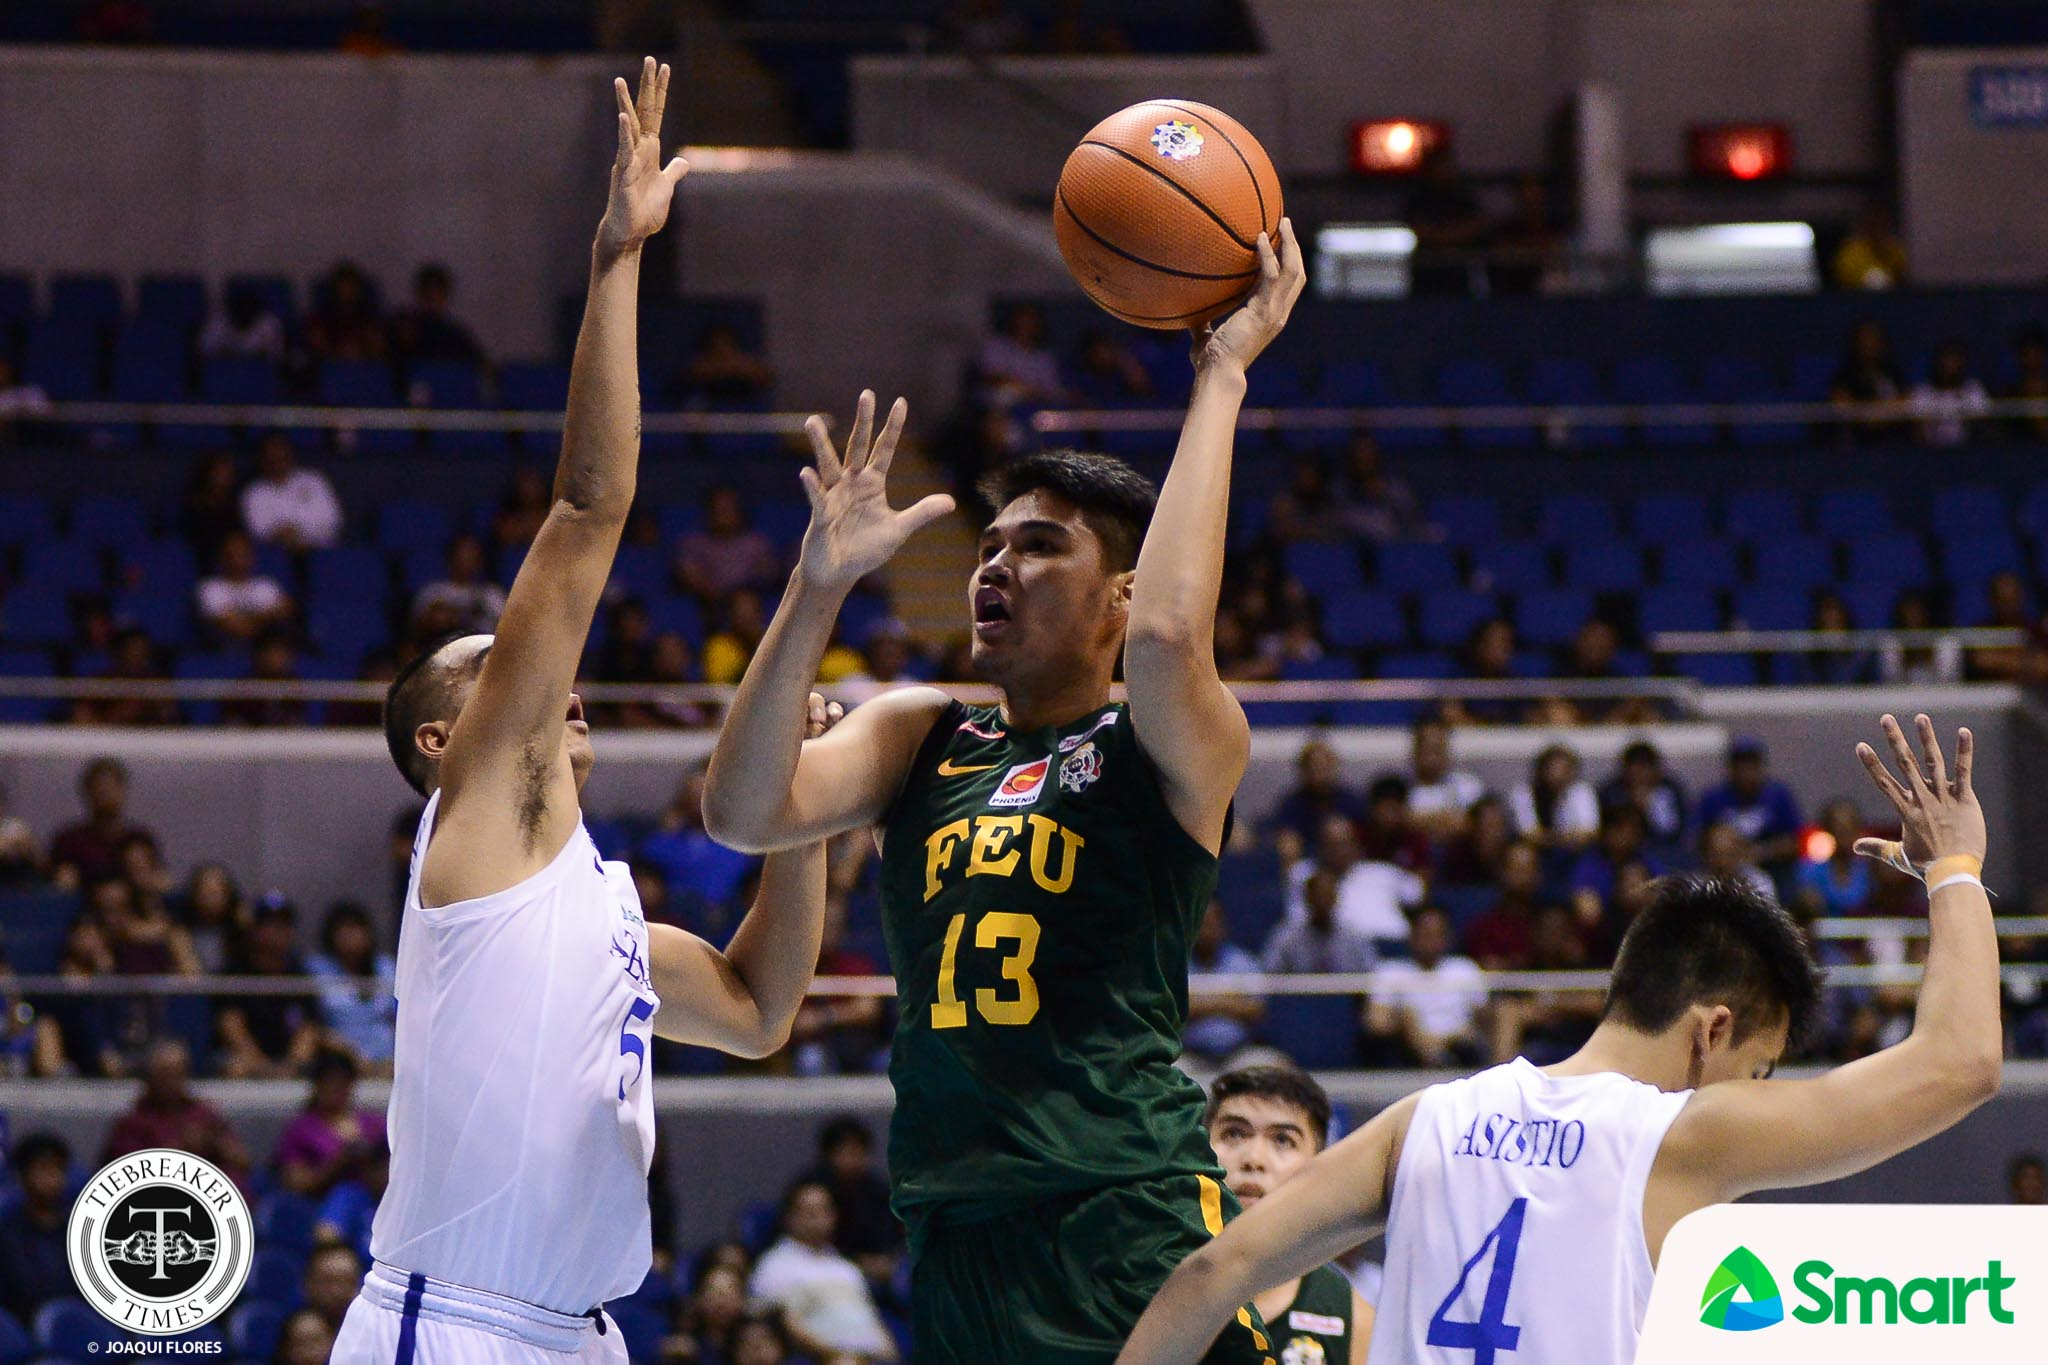 Philippine Sports News - Tiebreaker Times Arvin Tolentino was extra motivated facing Ateneo Basketball FEU News UAAP  UAAP Season 80 Men's Basketball UAAP Season 80 FEU Men's Basketball Arvin Tolentino